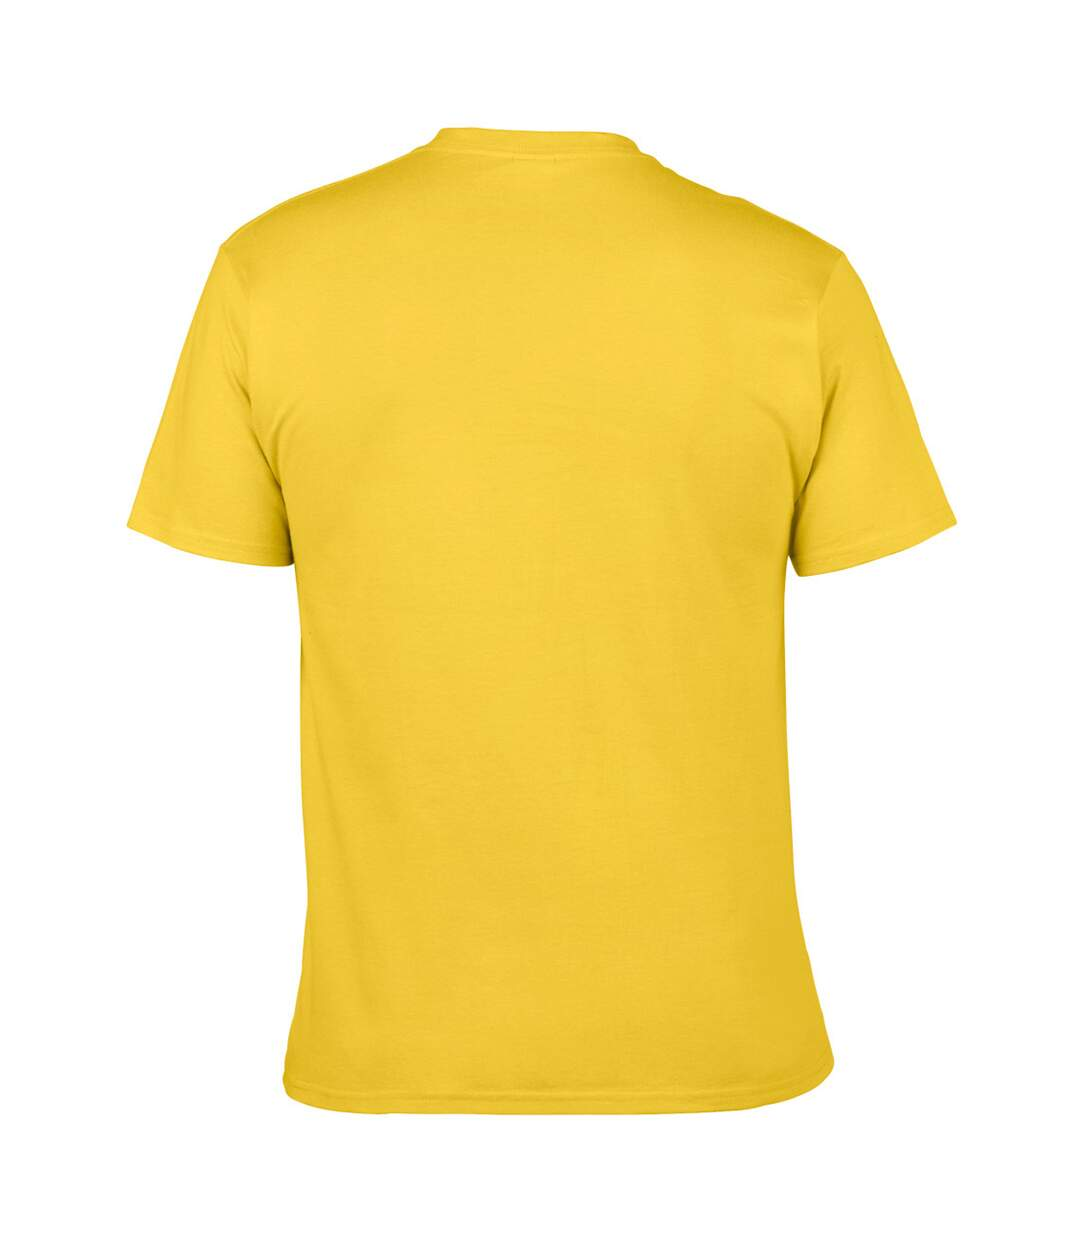 Gildan Mens Short Sleeve Soft-Style T-Shirt (Jade) - UTBC484